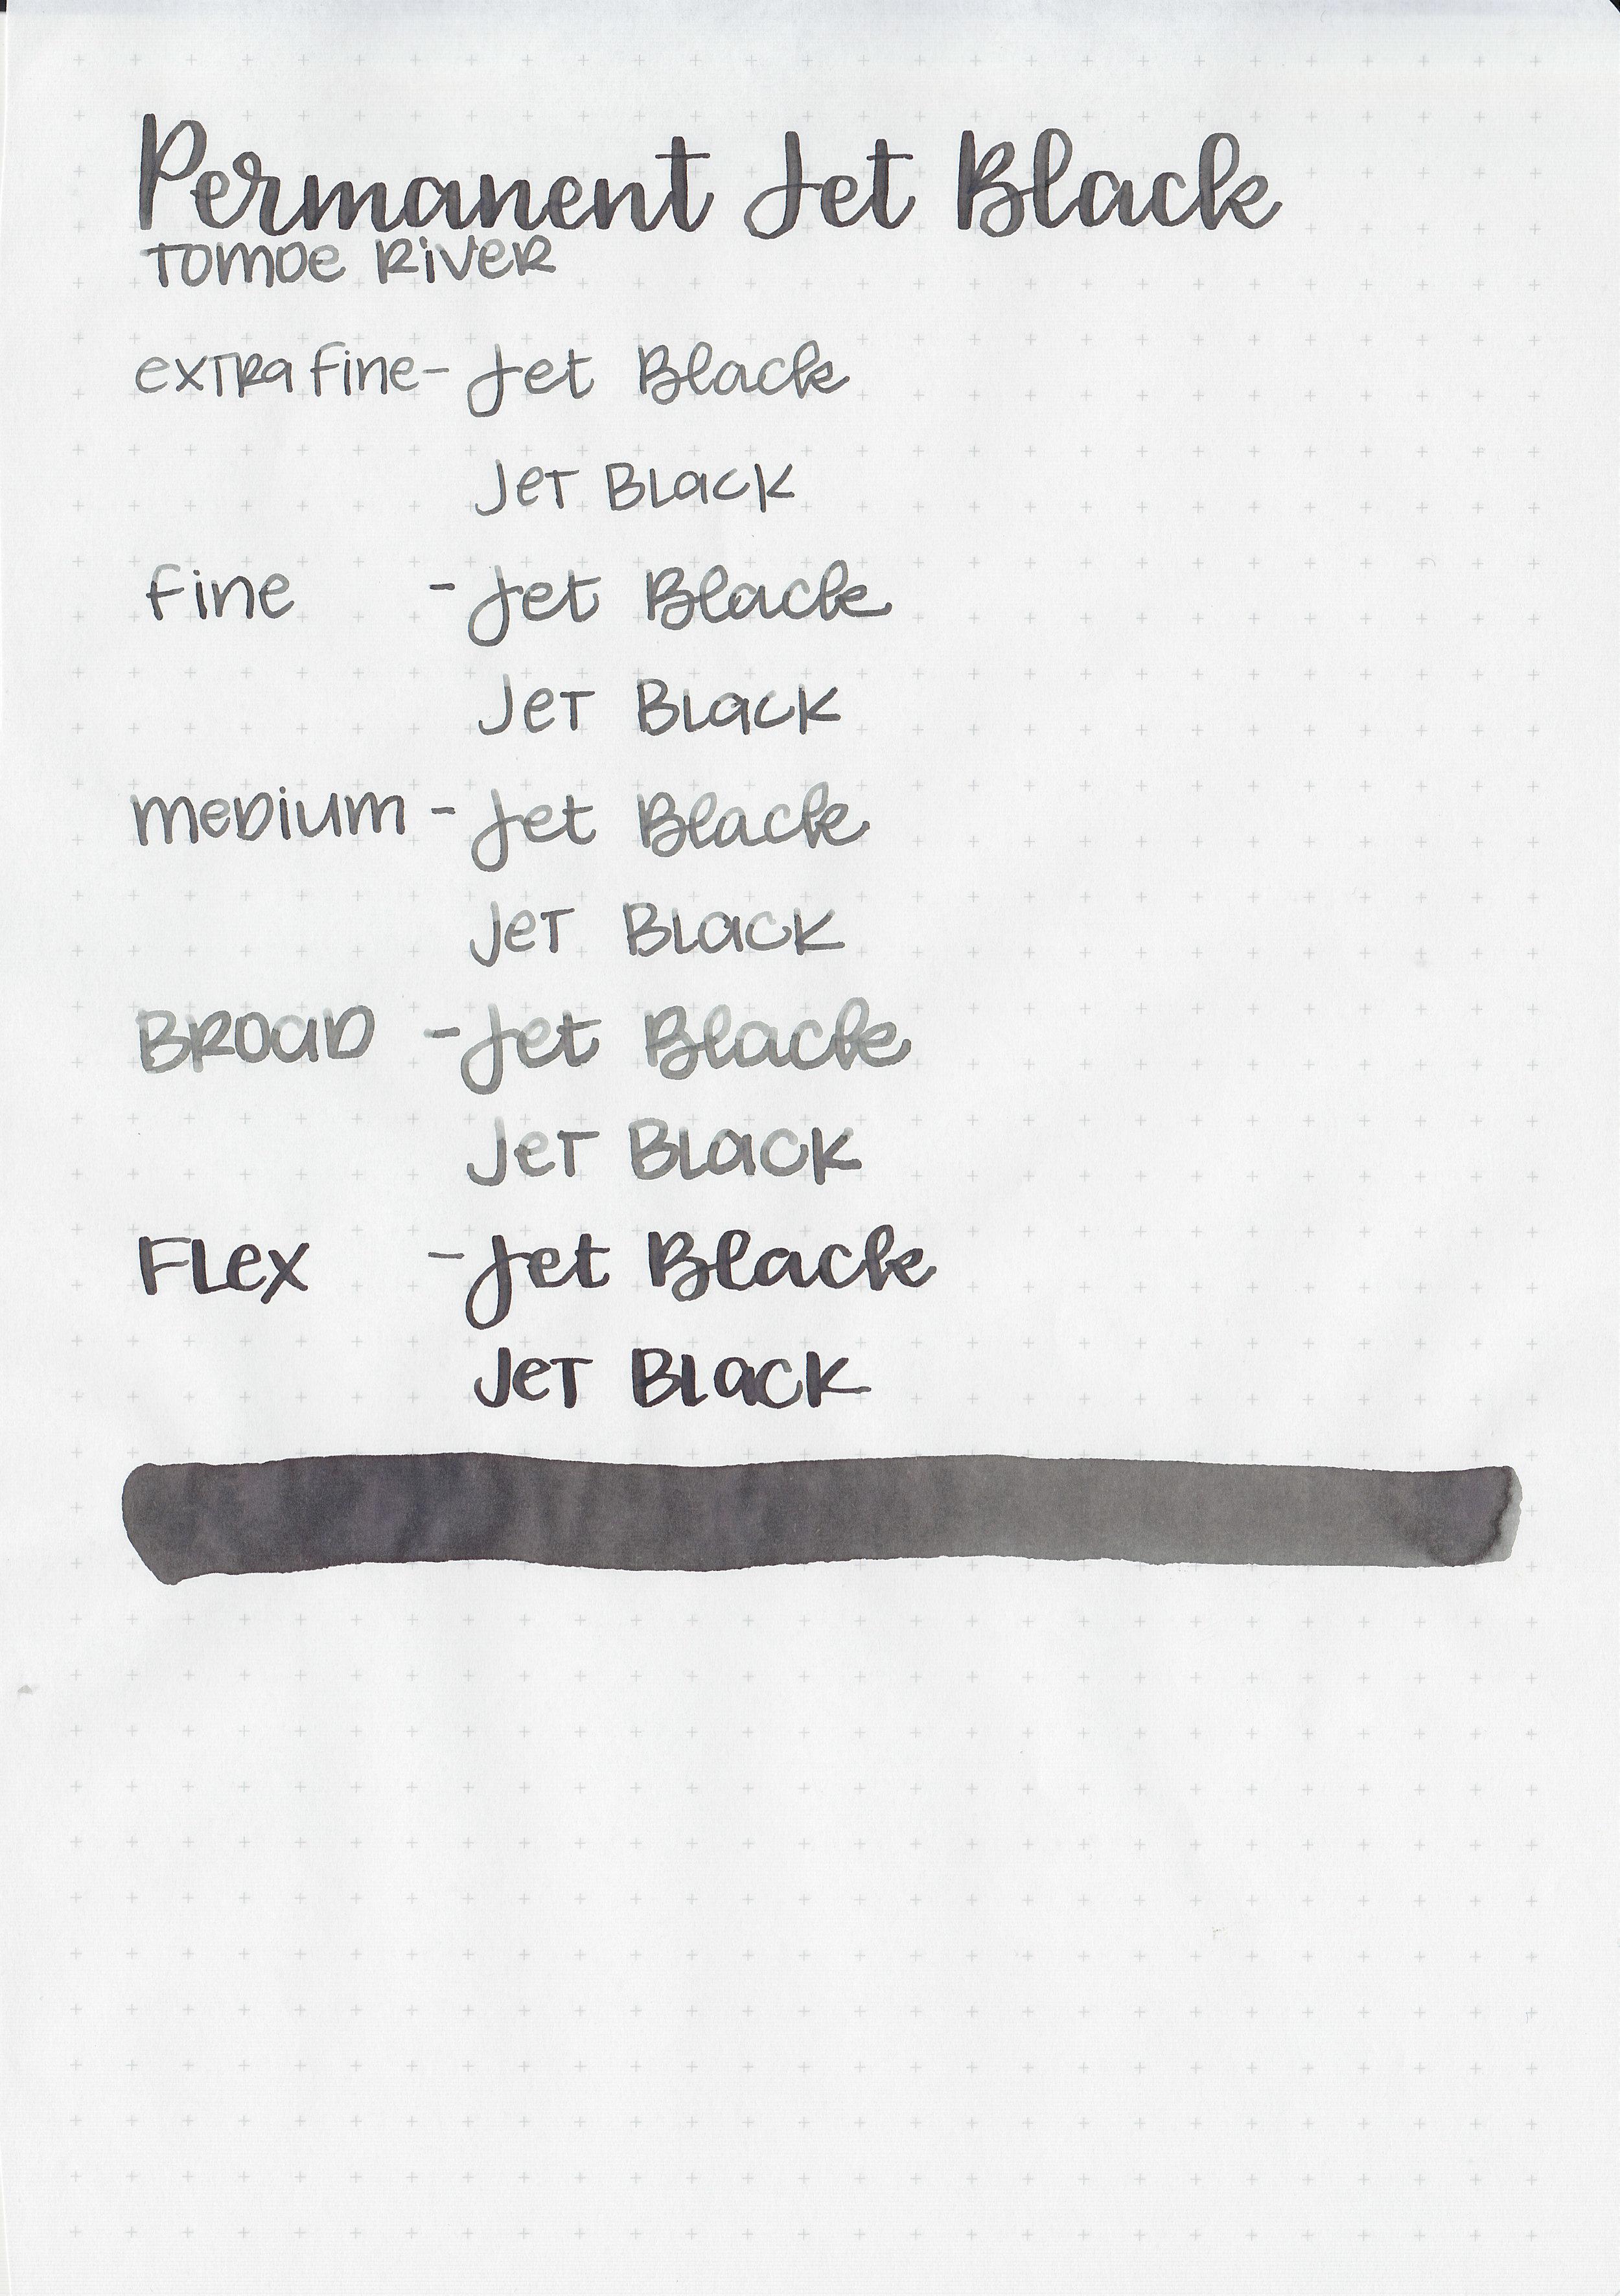 shea-perm-jet-black-7.jpg